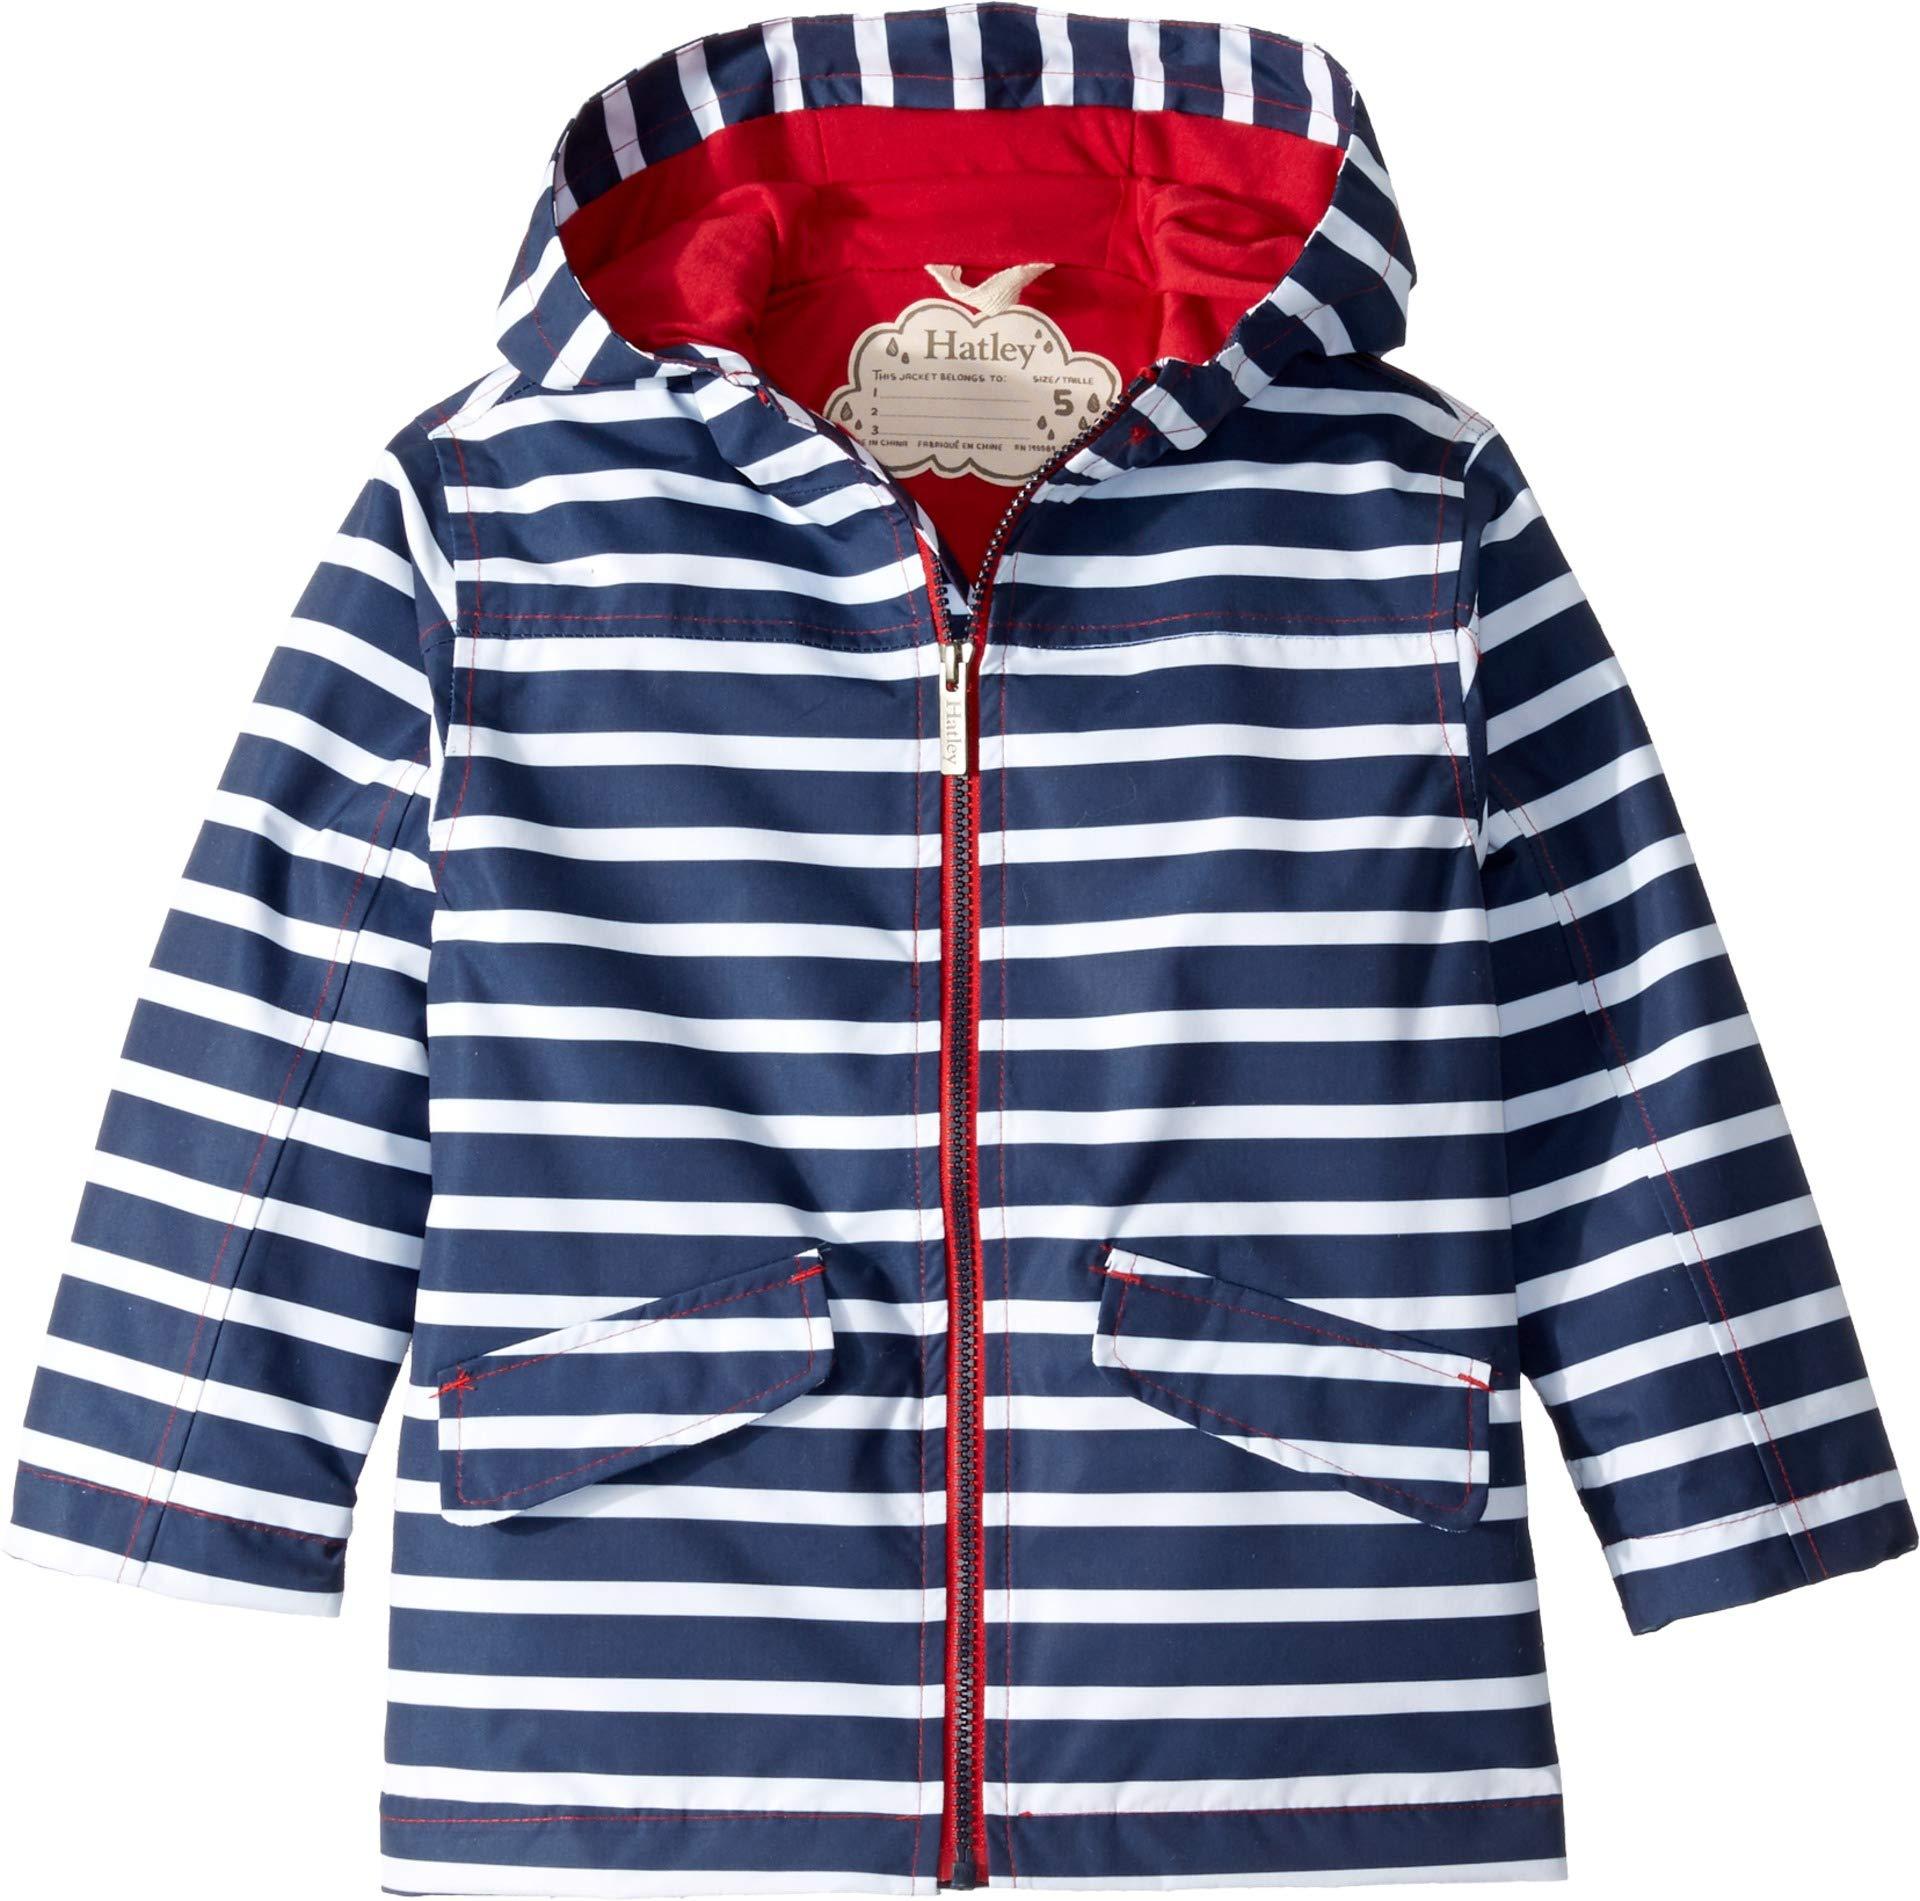 Hatley Kids Baby Boy's Navy Stripes Microfiber Rain Jacket (Toddler/Little Kids/Big Kids) Blue 4T